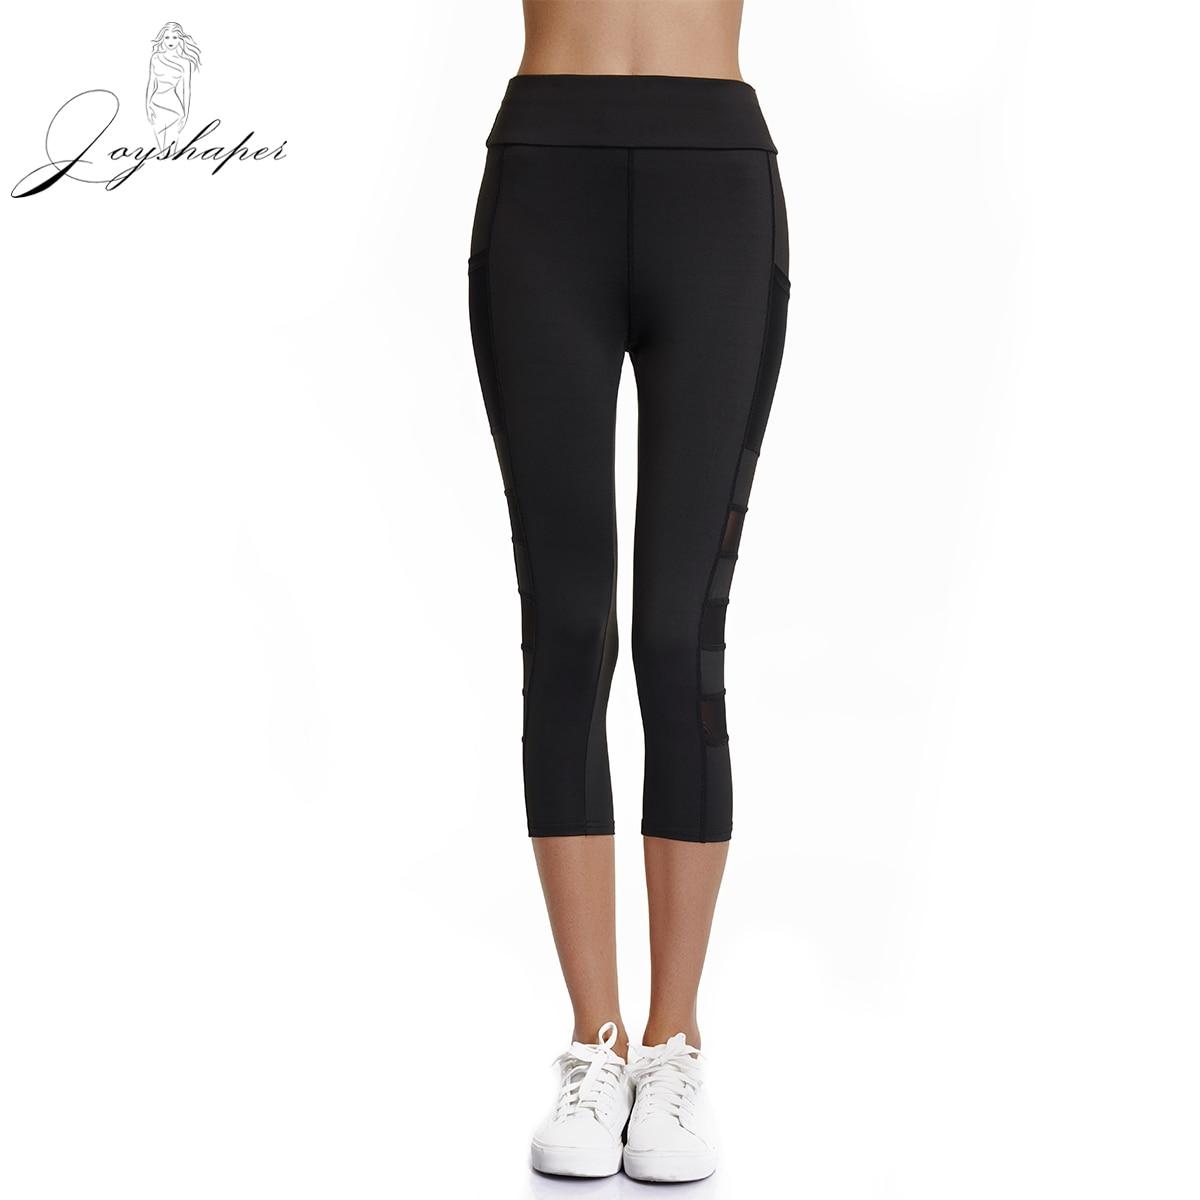 Joyshaper 2019 Workout Leggings With Pockets Plus Size Well Fitting Women Breathable Mesh Mid-Calf Gym Sport Pants Black Legging